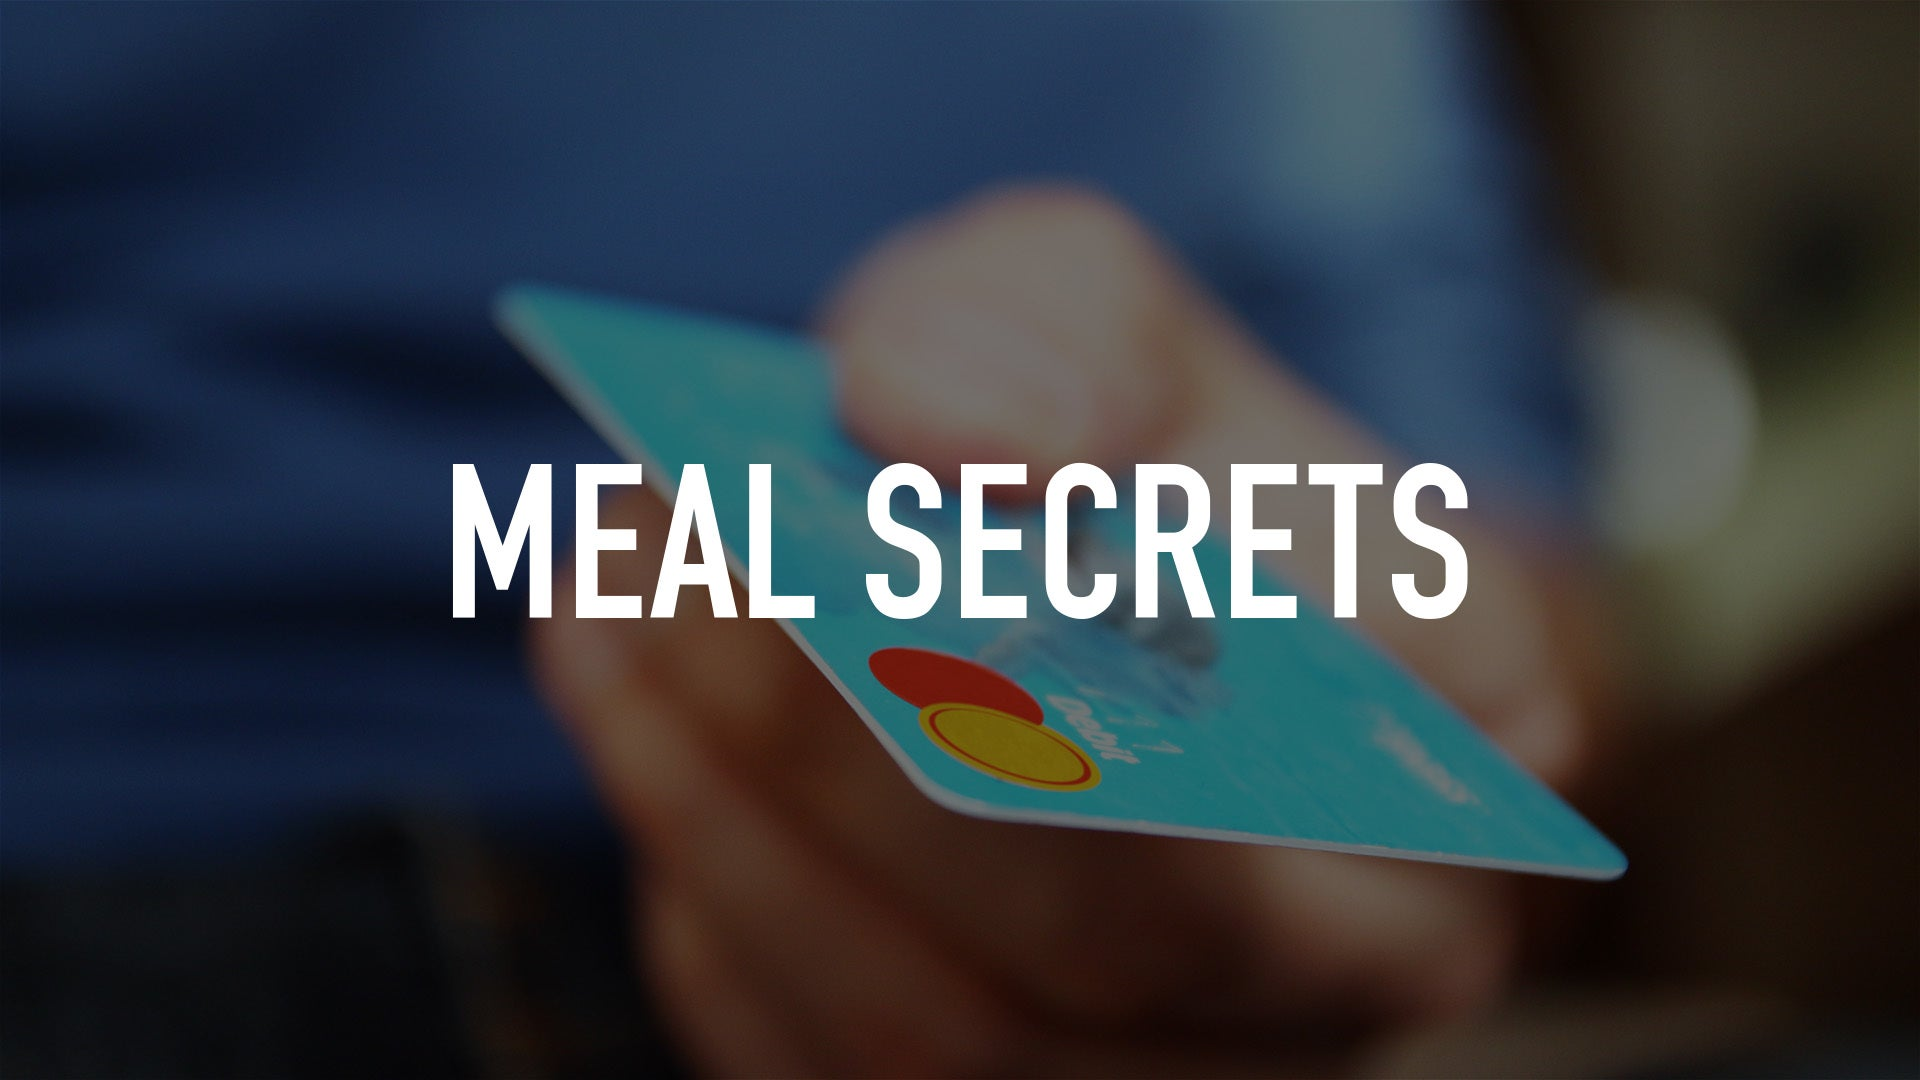 Meal Secrets